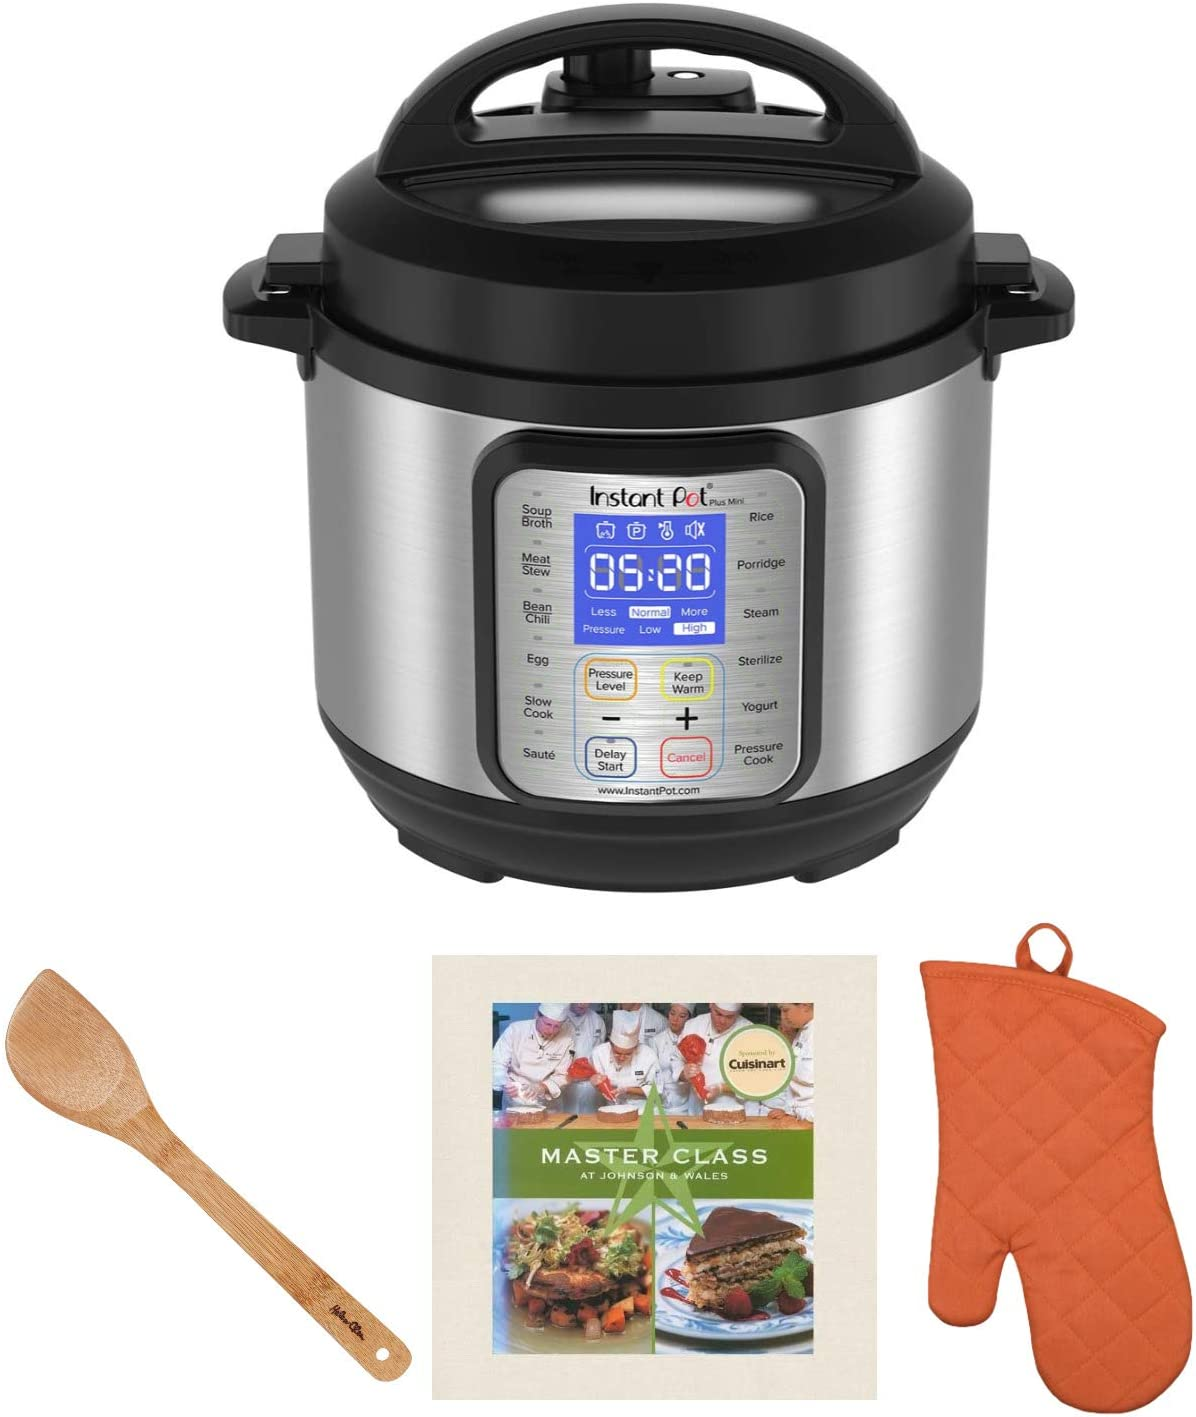 Instant Pot Duo Plus Mini 3-Quart, 9-in-1 Programmable Multi-Cooker Bundle with Spatula, Mitt and Cookbook Bundle (4 Items)